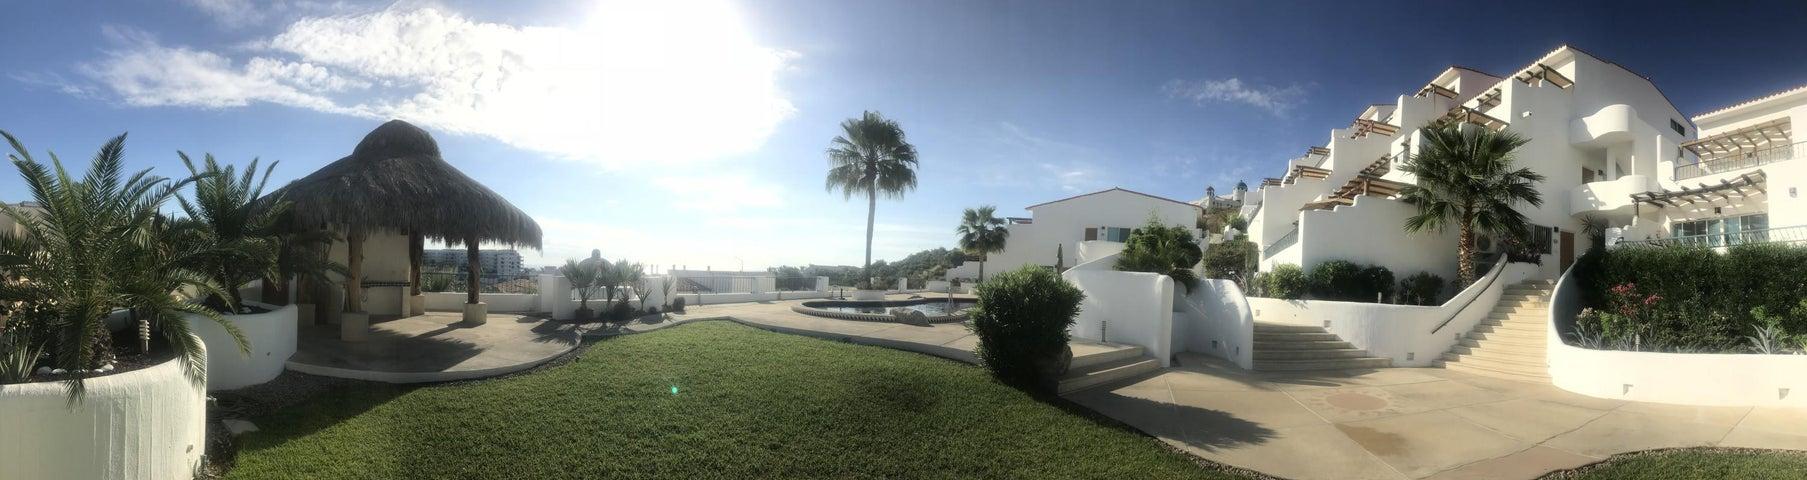 Loma Linda Panorama